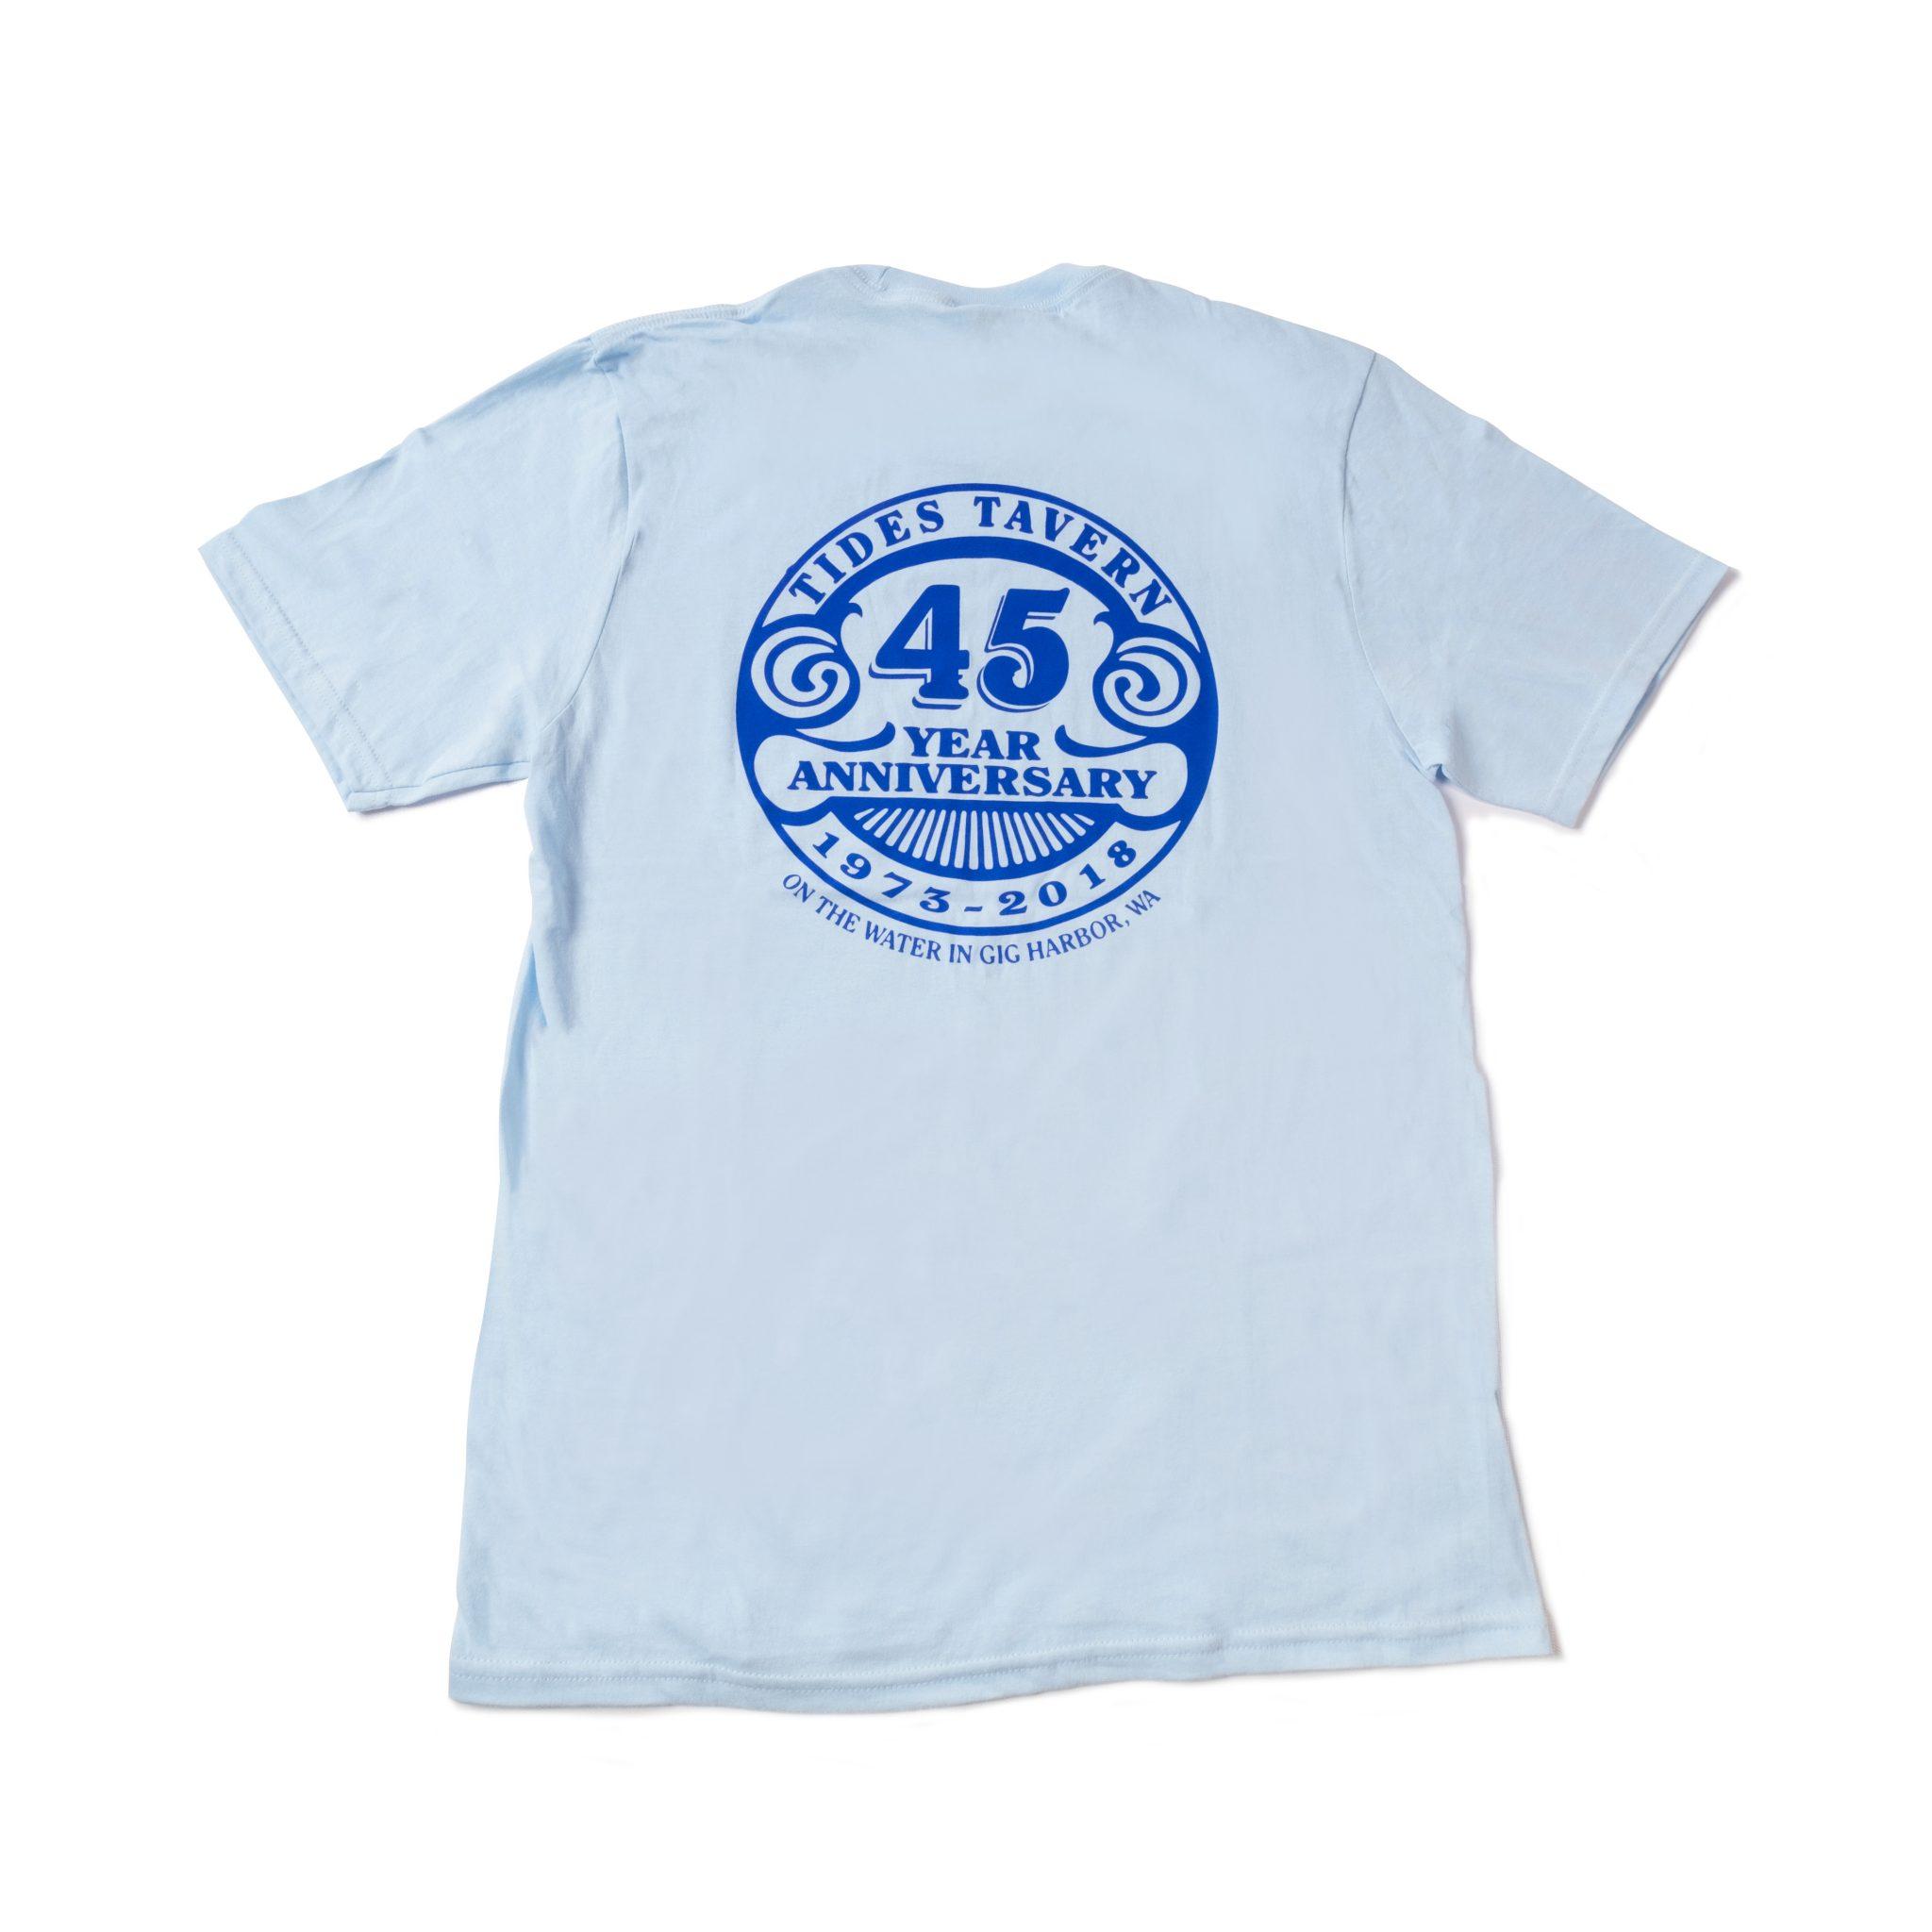 Tides 45th Anniversary T Shirt Blue Tides Tavern